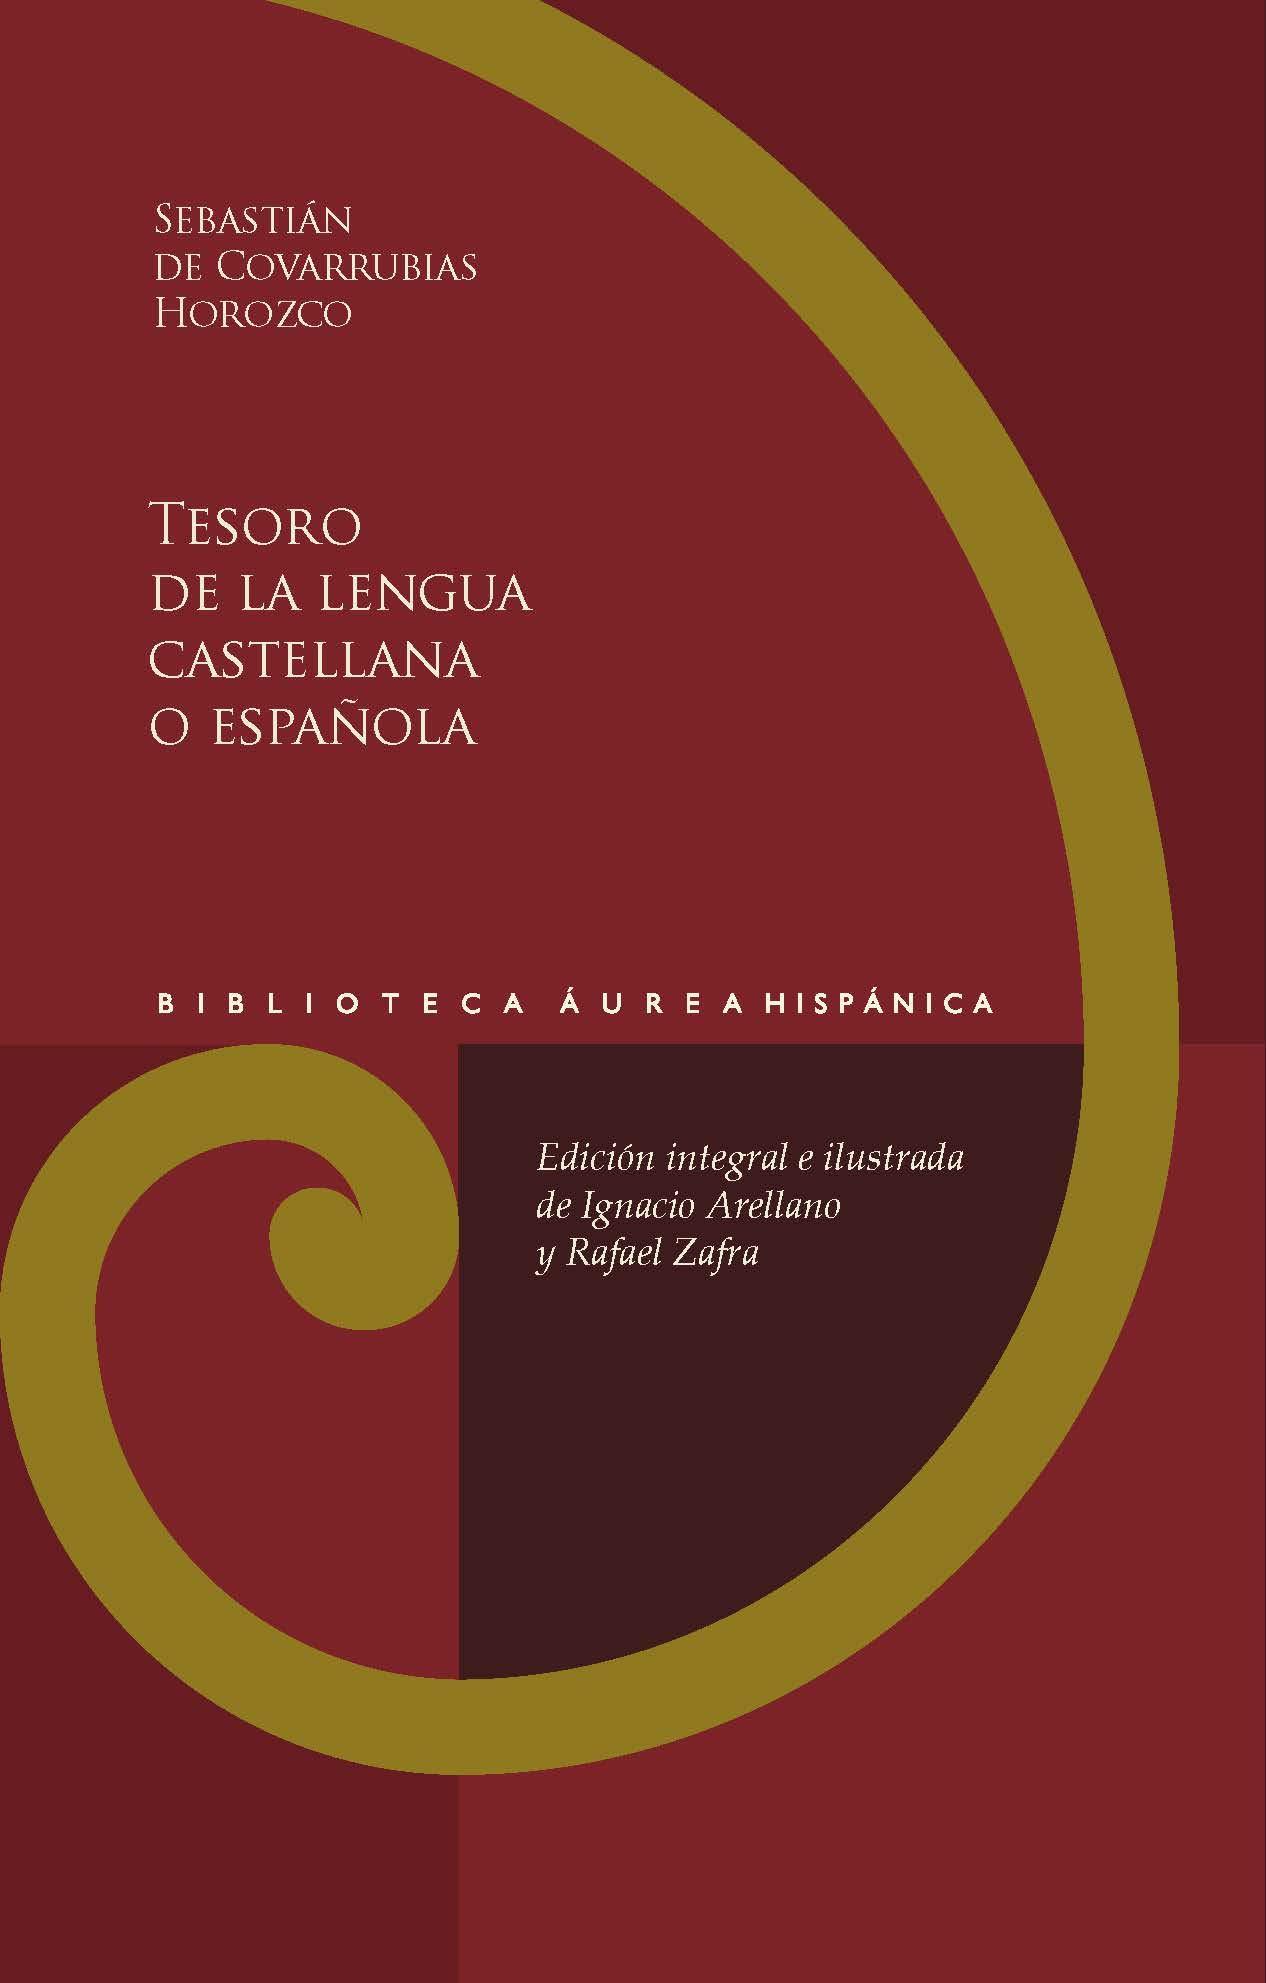 Tesoro de la lengua castellana o española: 21 Biblioteca Áurea Hispánica: Amazon.es: Covarrubias Orozco, Sebastián de, Arellano, Ignacio, Zafra, Rafael: Libros